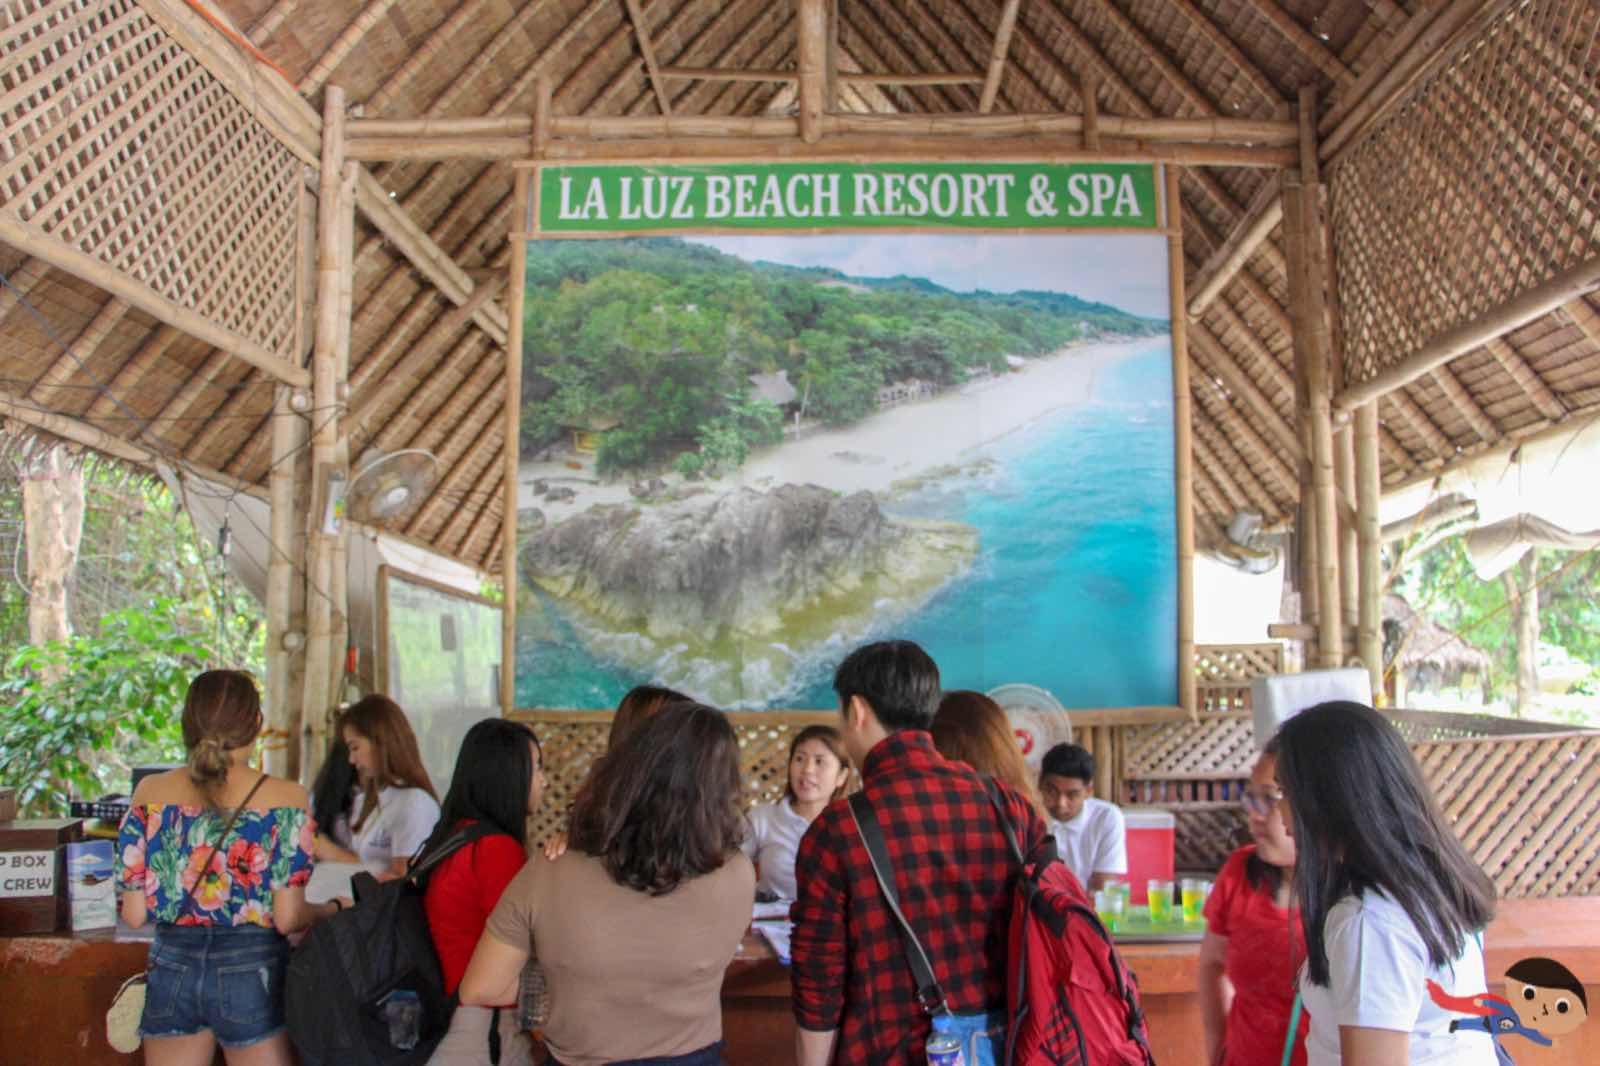 Reception area in La Luz Beach Resort & Spa